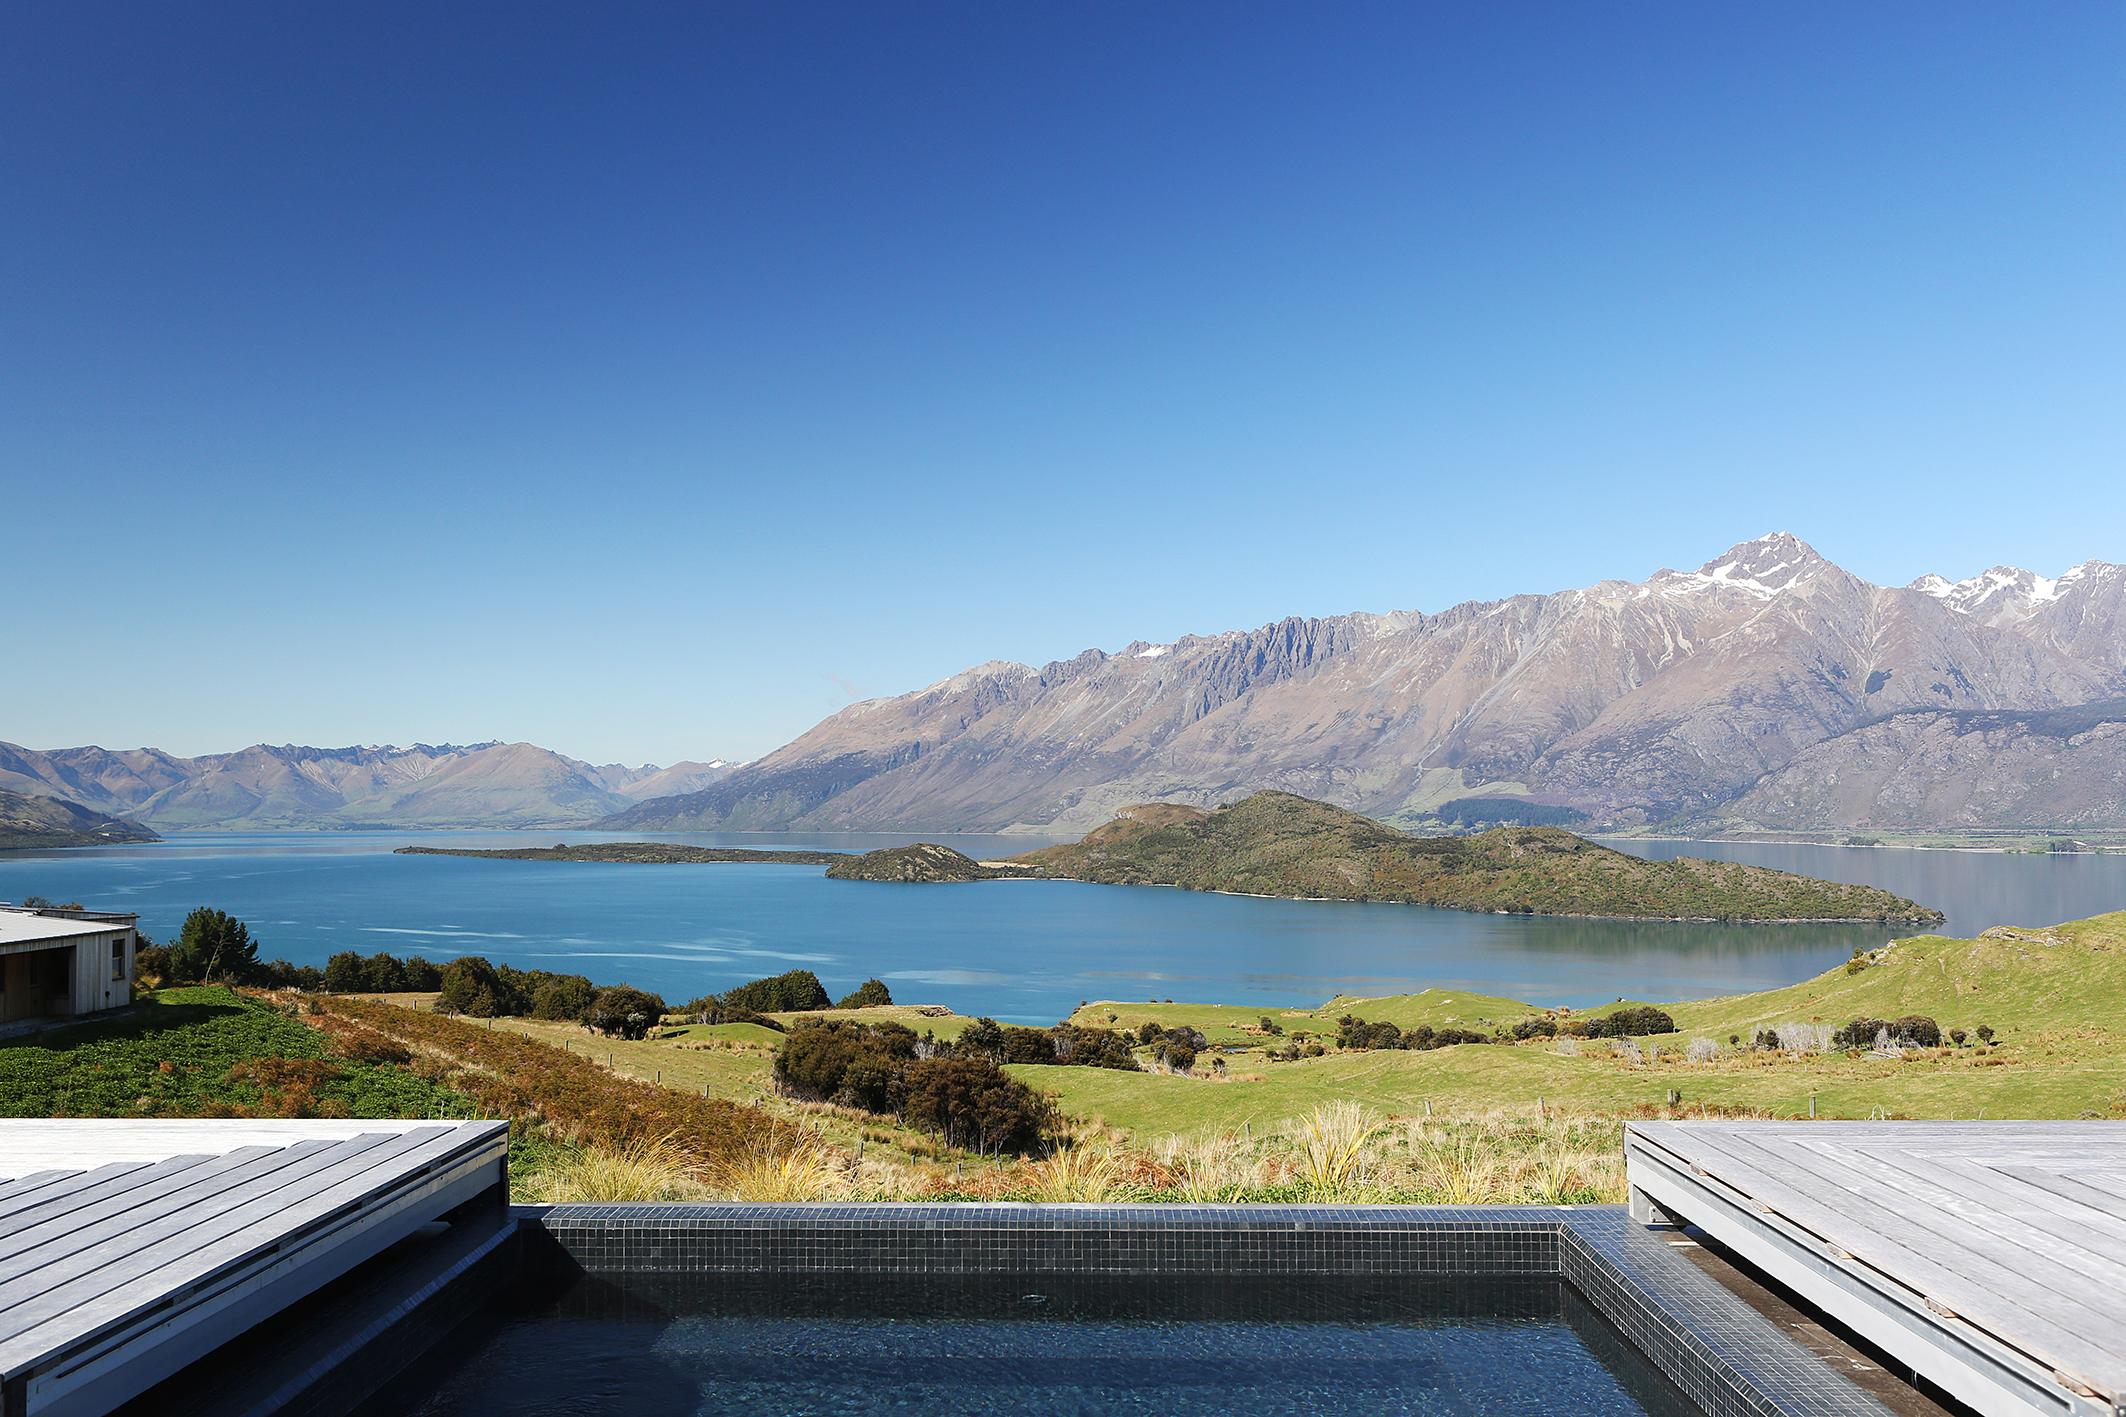 InBedWith_RhiannonTaylor_AroHa_review_newzealand4